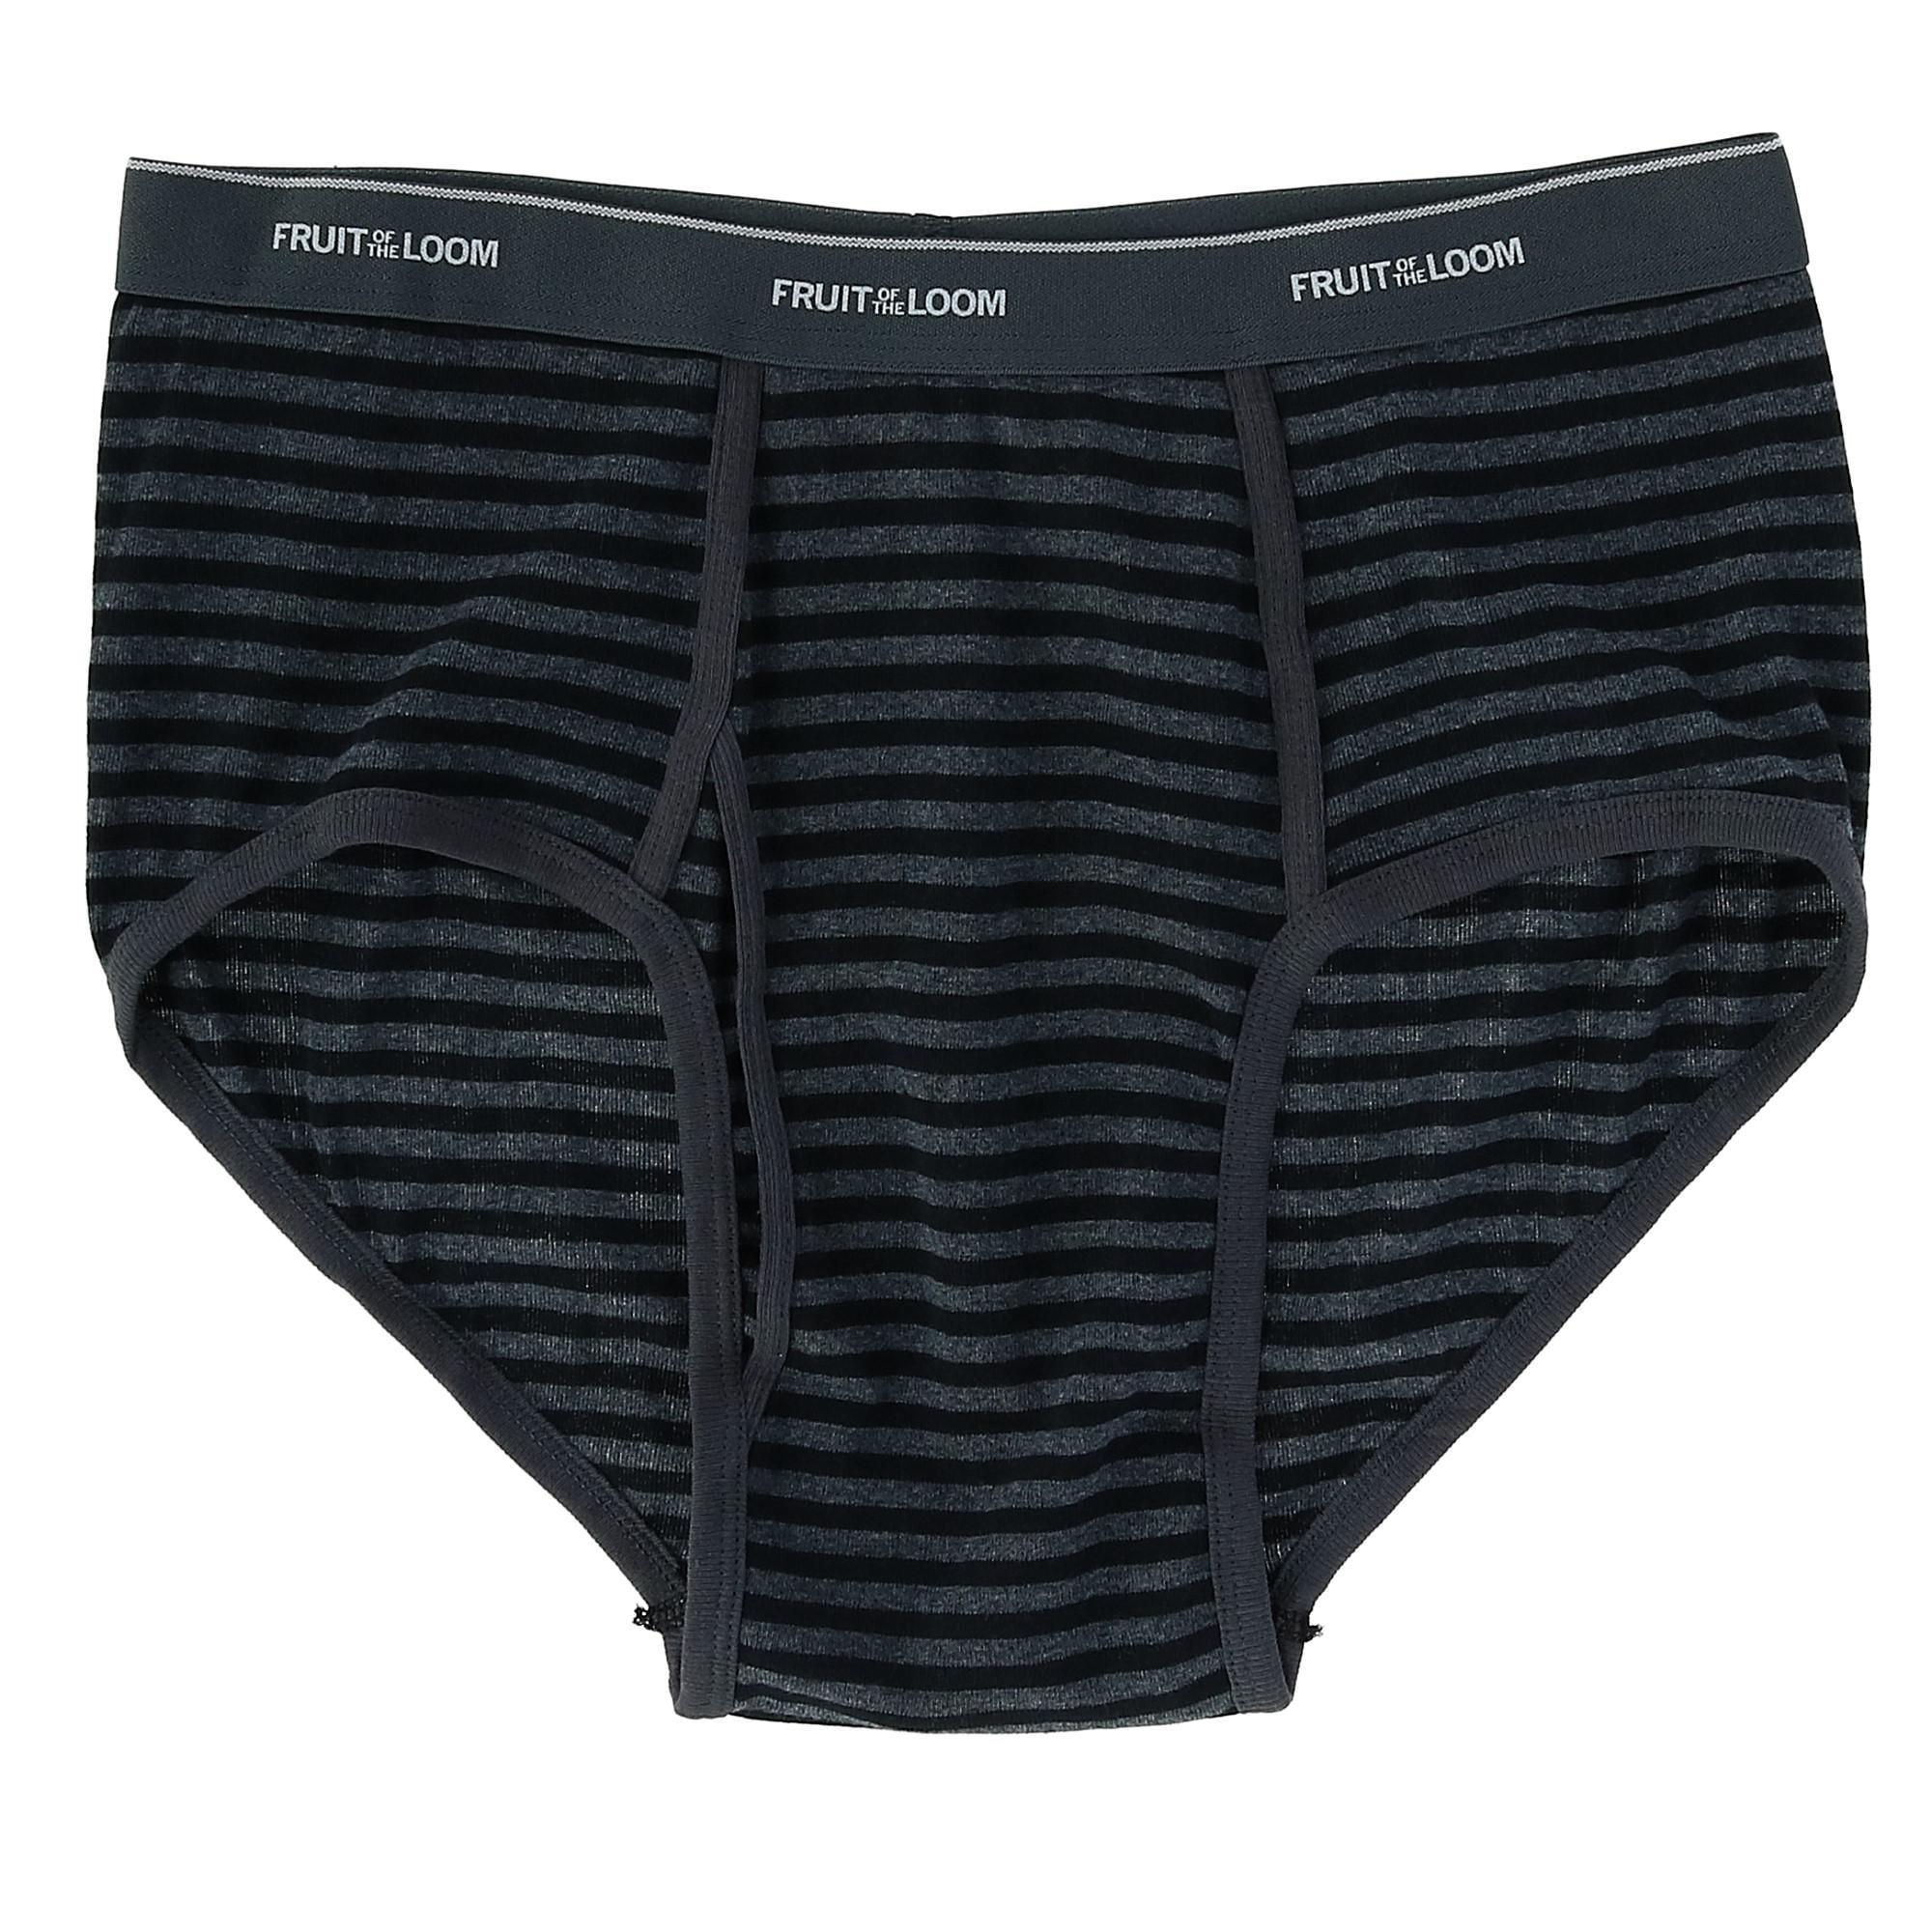 Fruit of the Loom Mens 5Pack White Boxer Briefs 100/% Cotton Underwear 3XL